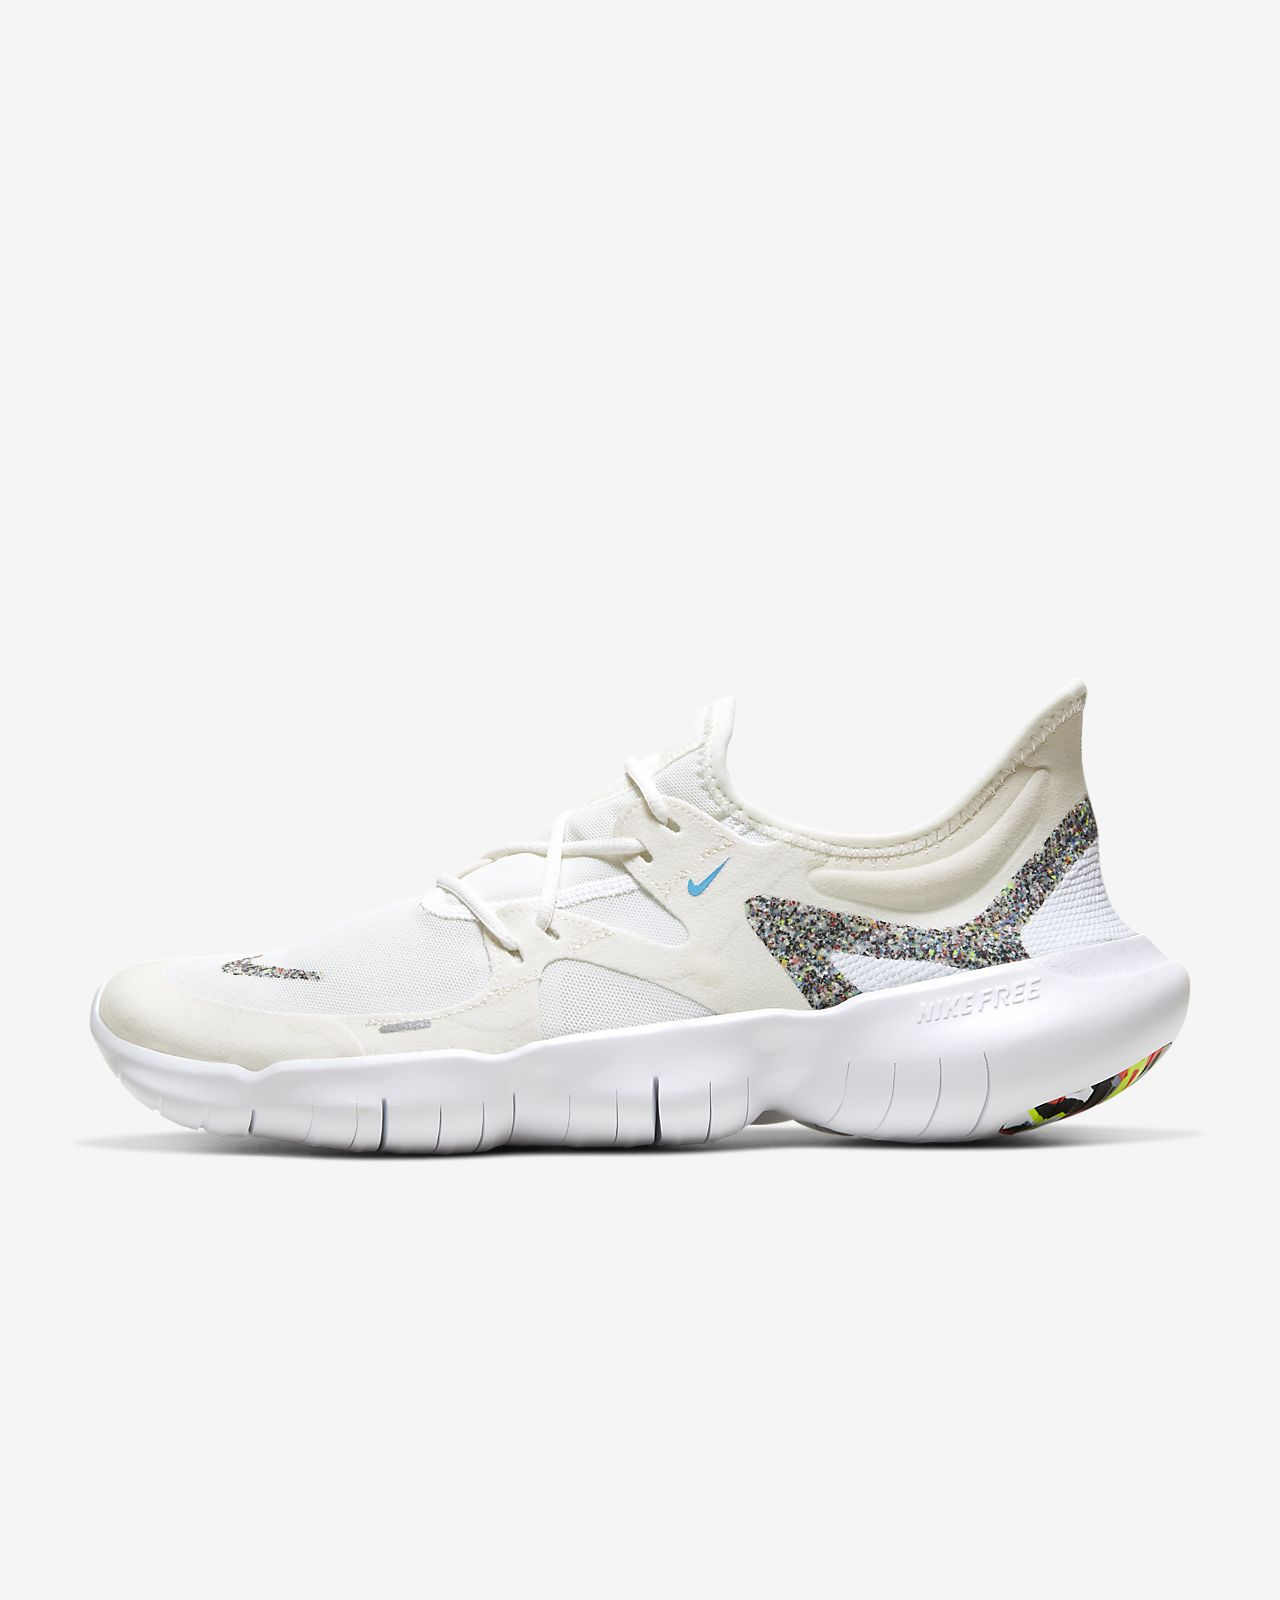 Nike Free RN 5.0 Damen Laufschuh